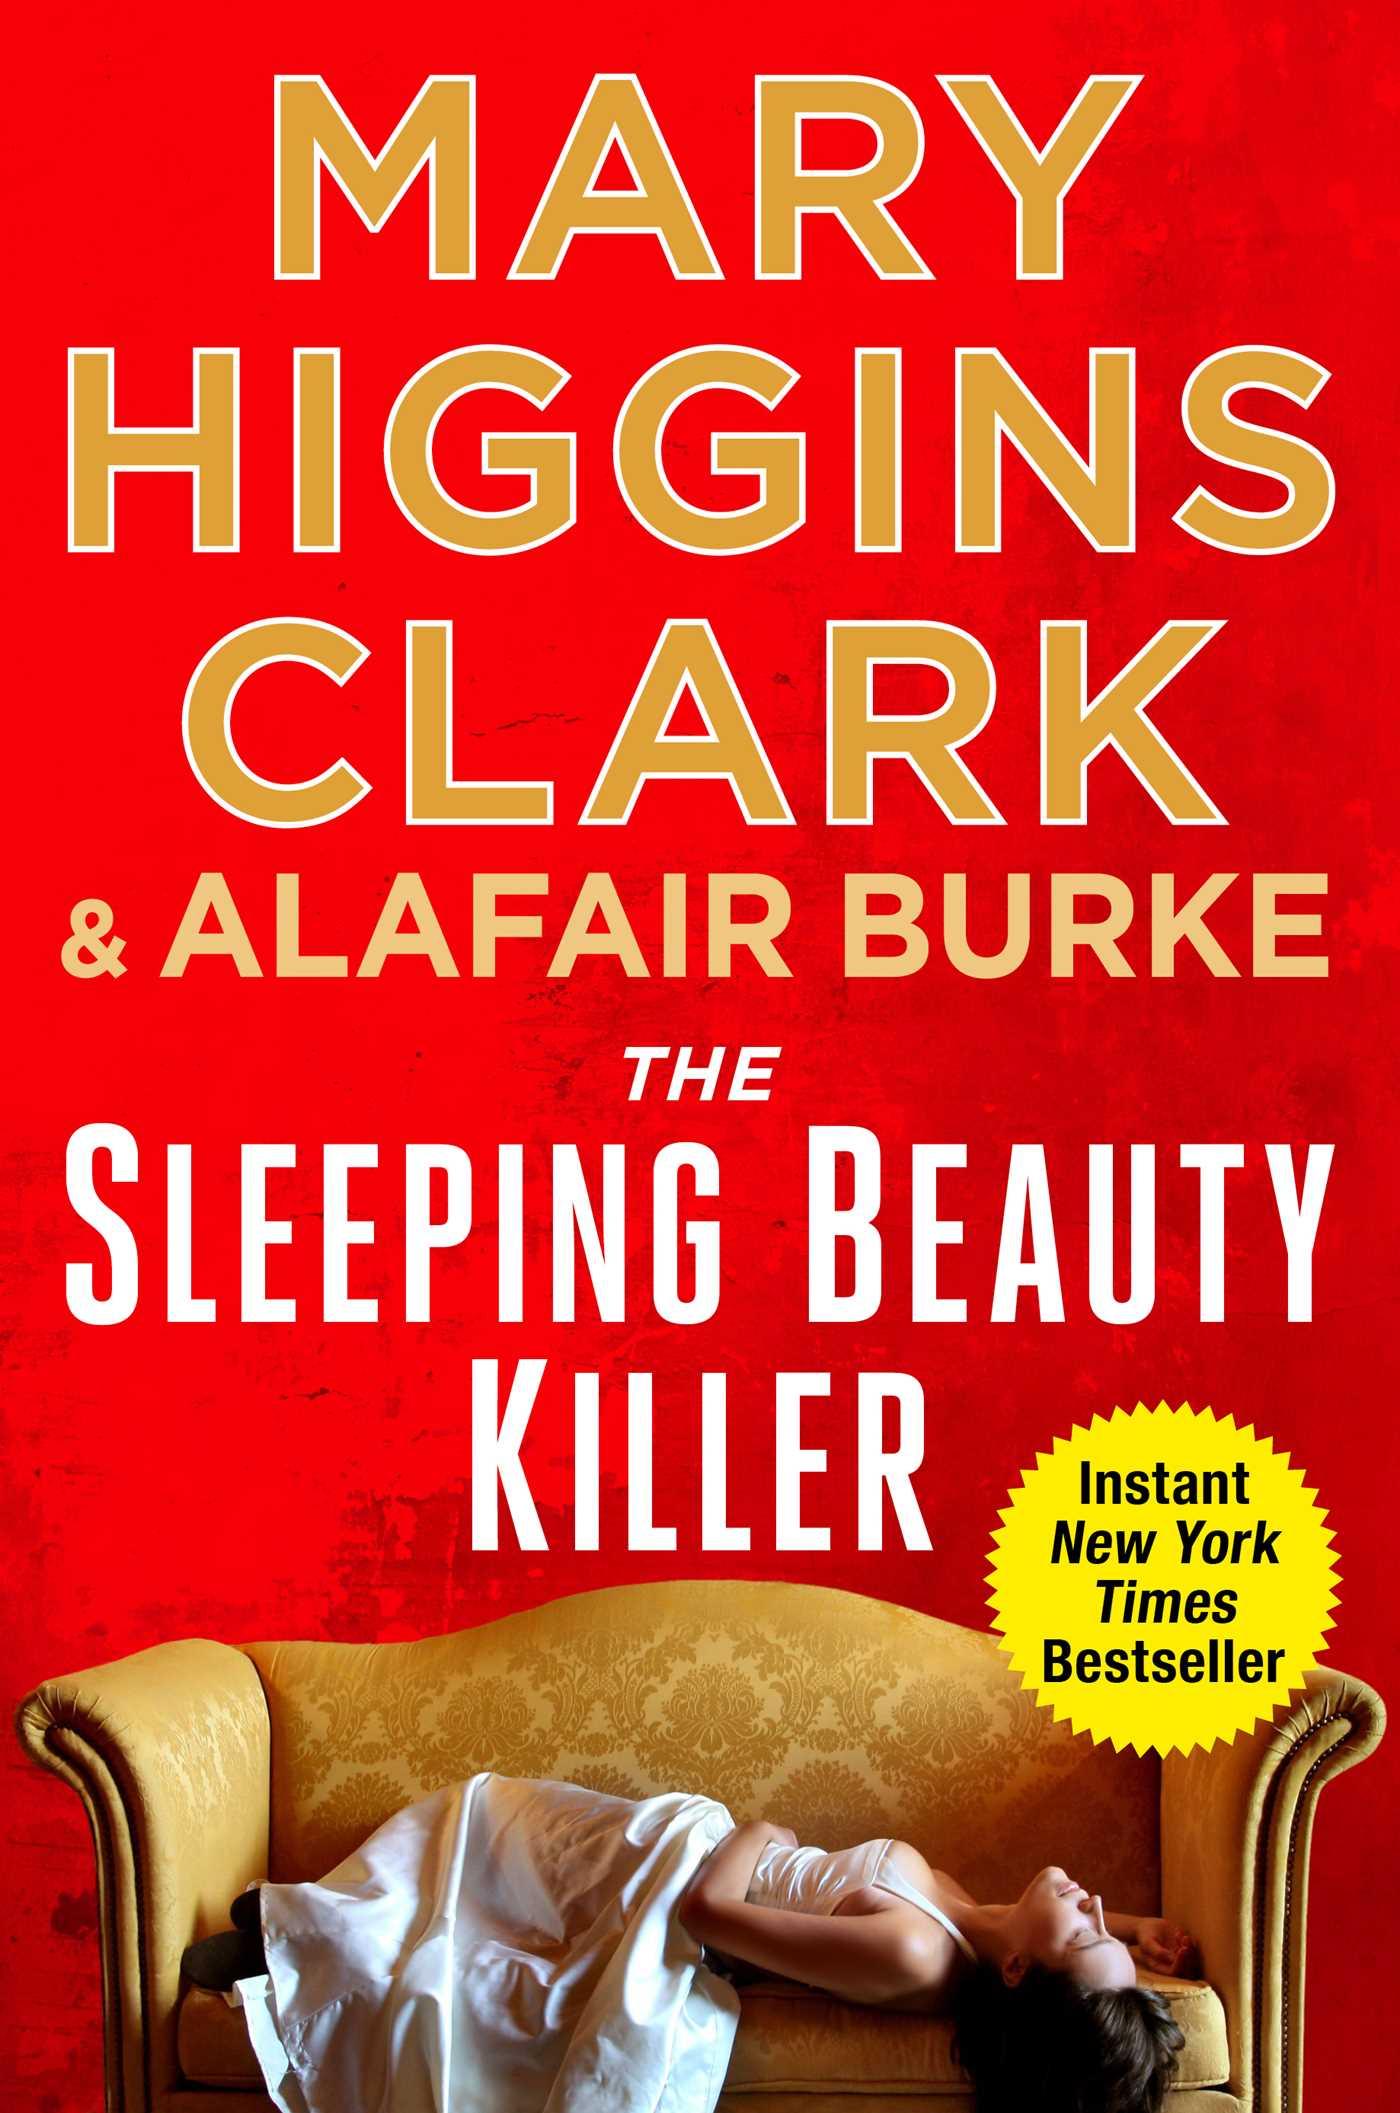 The sleeping beauty killer 9781501108600 hr